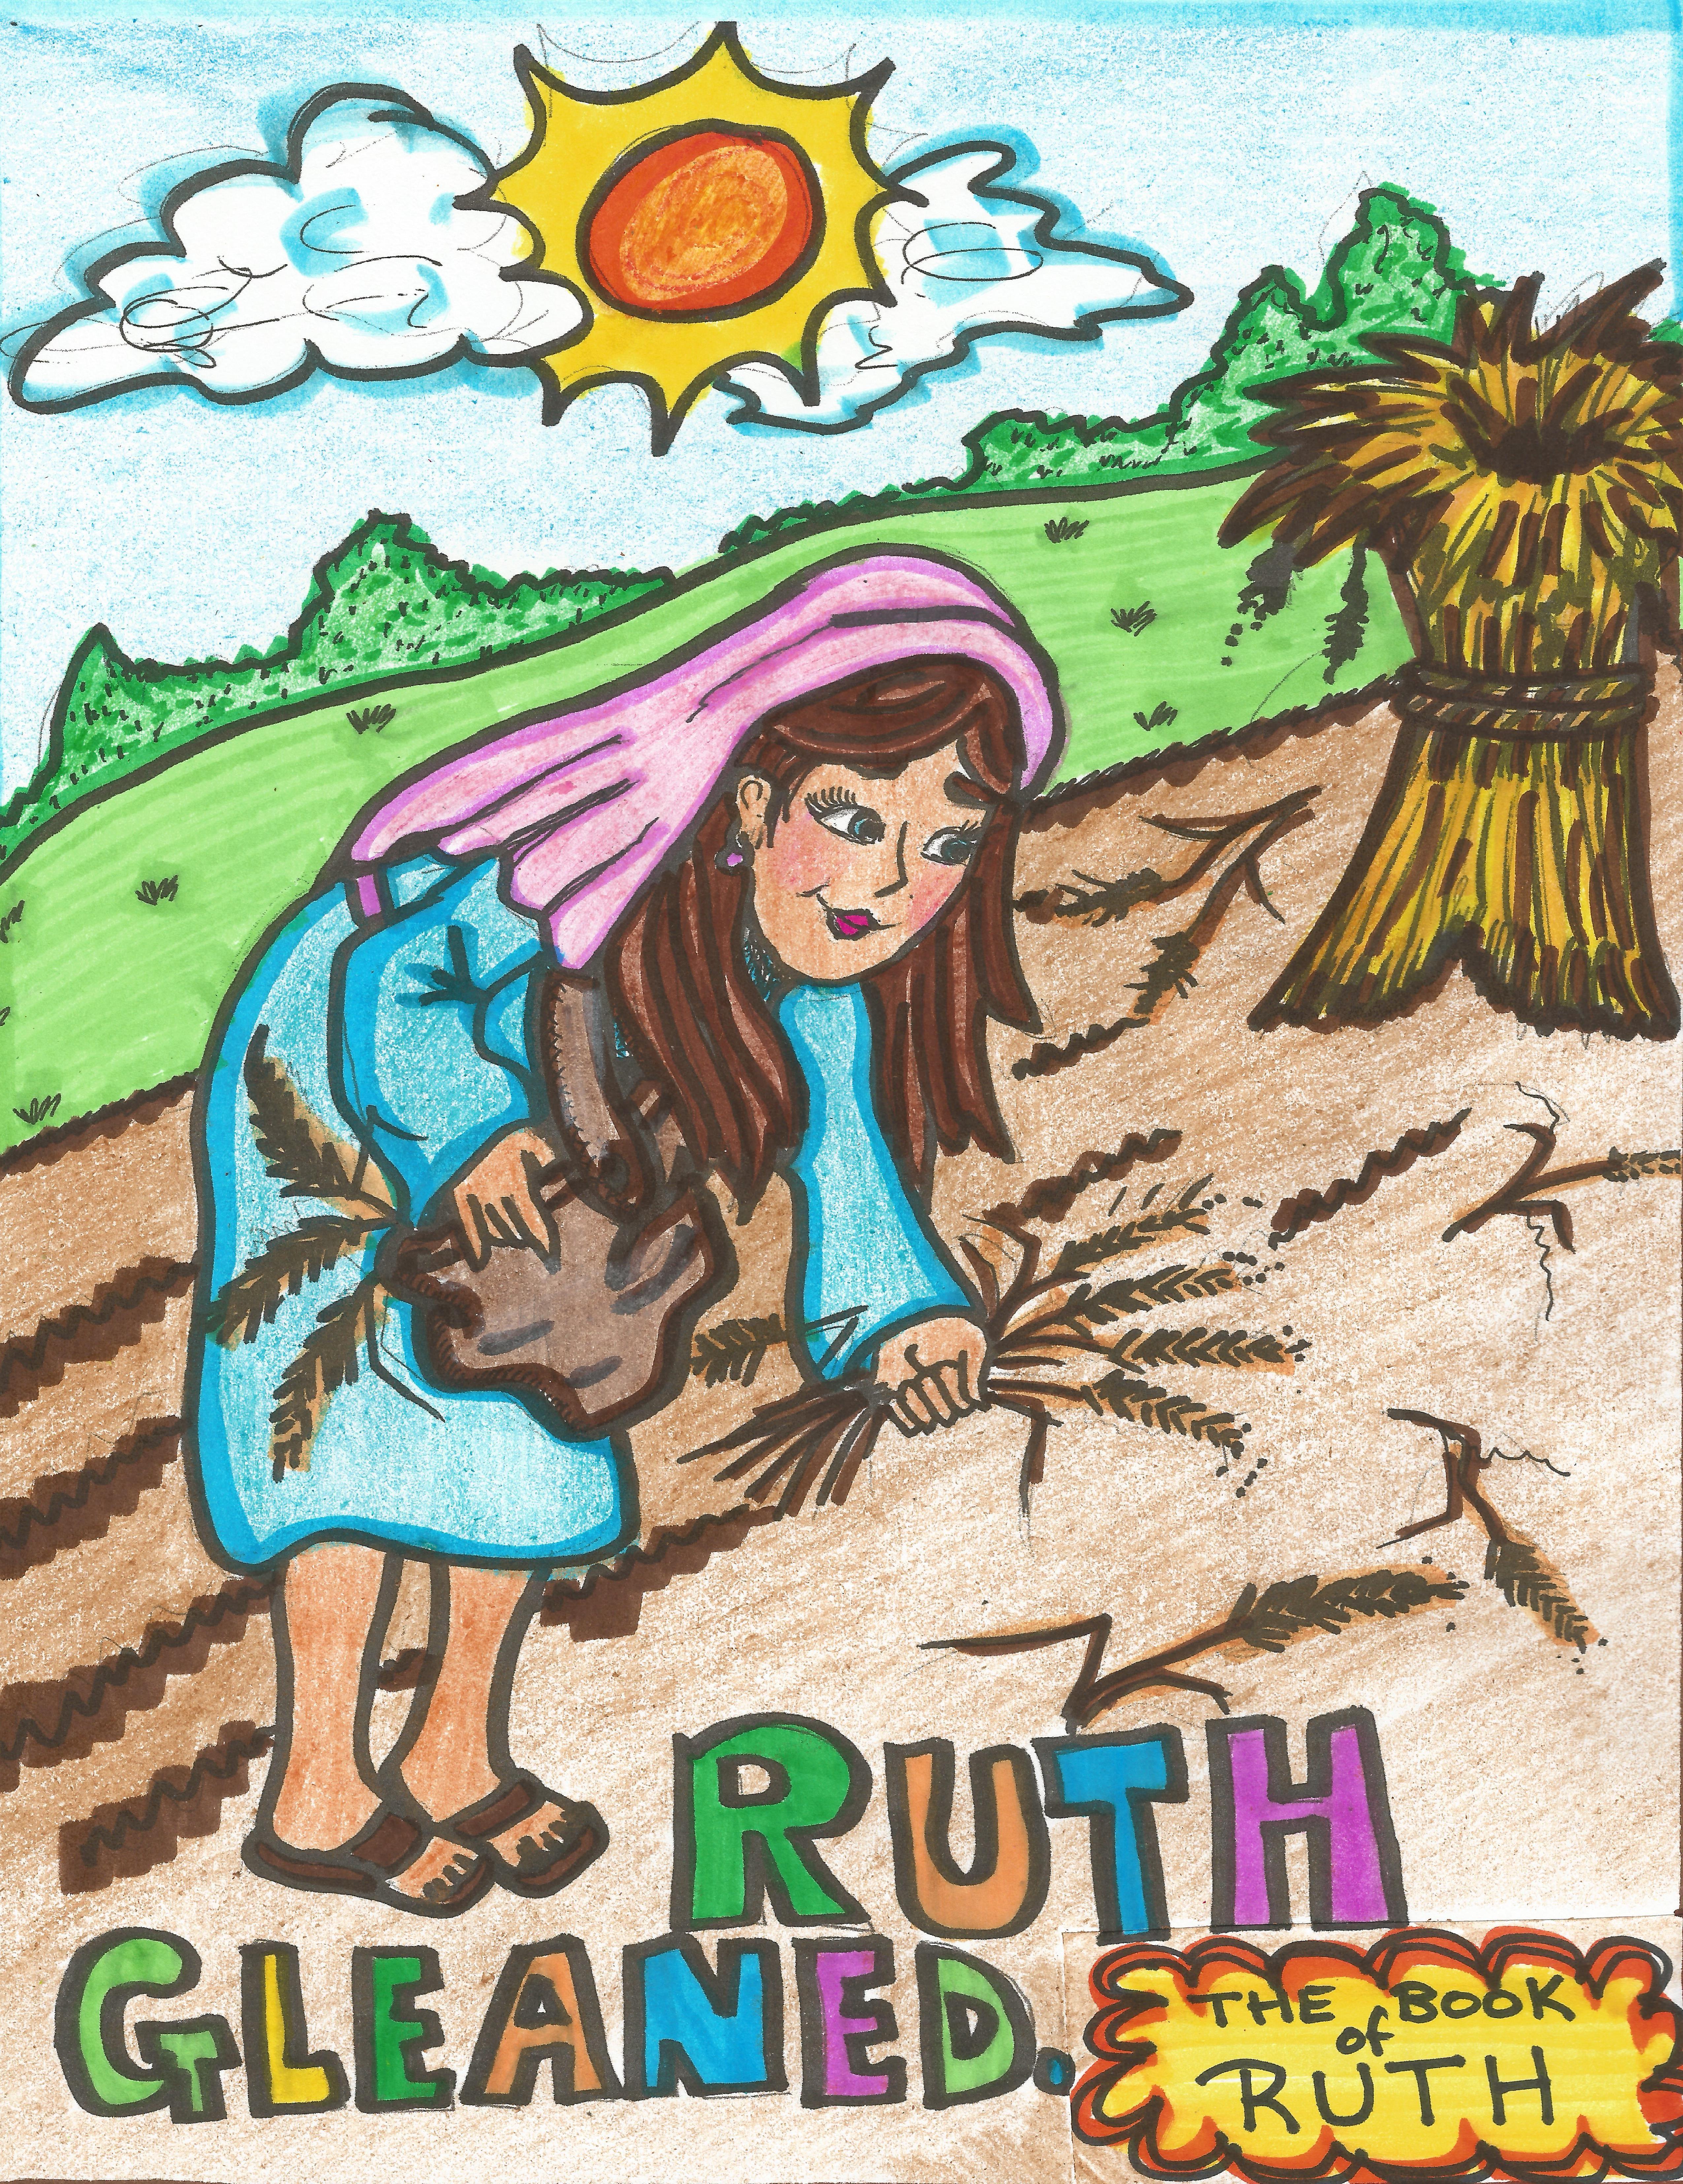 Ruth Bible Study - Love God Greatly